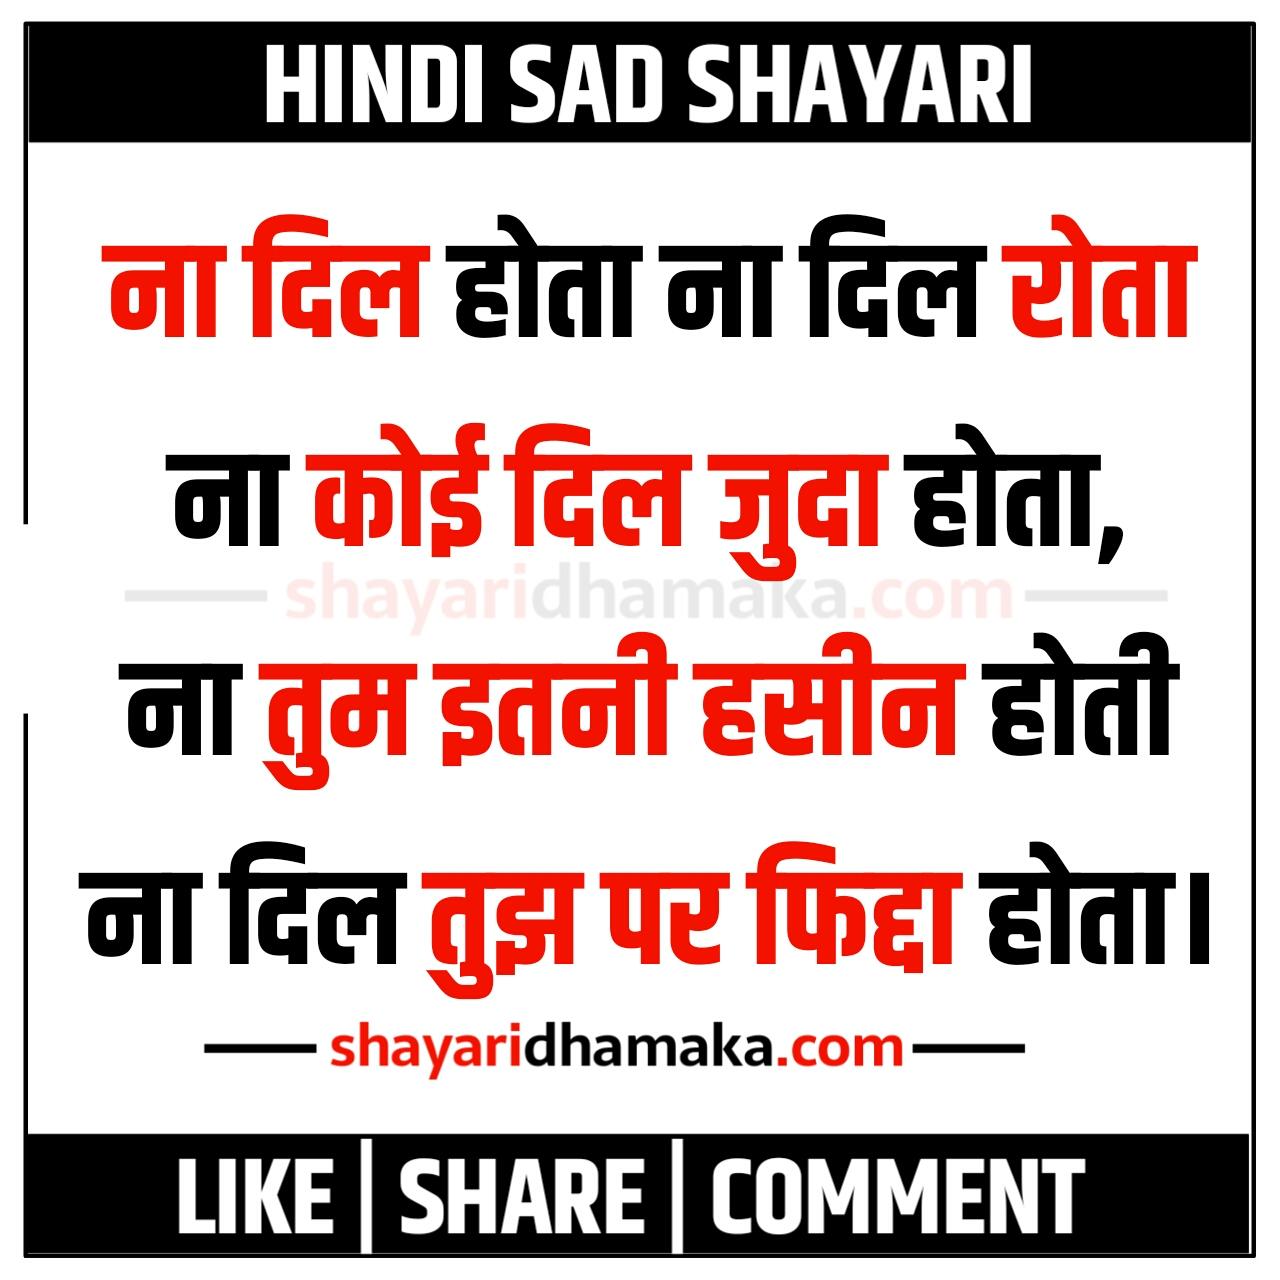 ना दिल होता ना दिल रोता - Dard Bhari Shayari